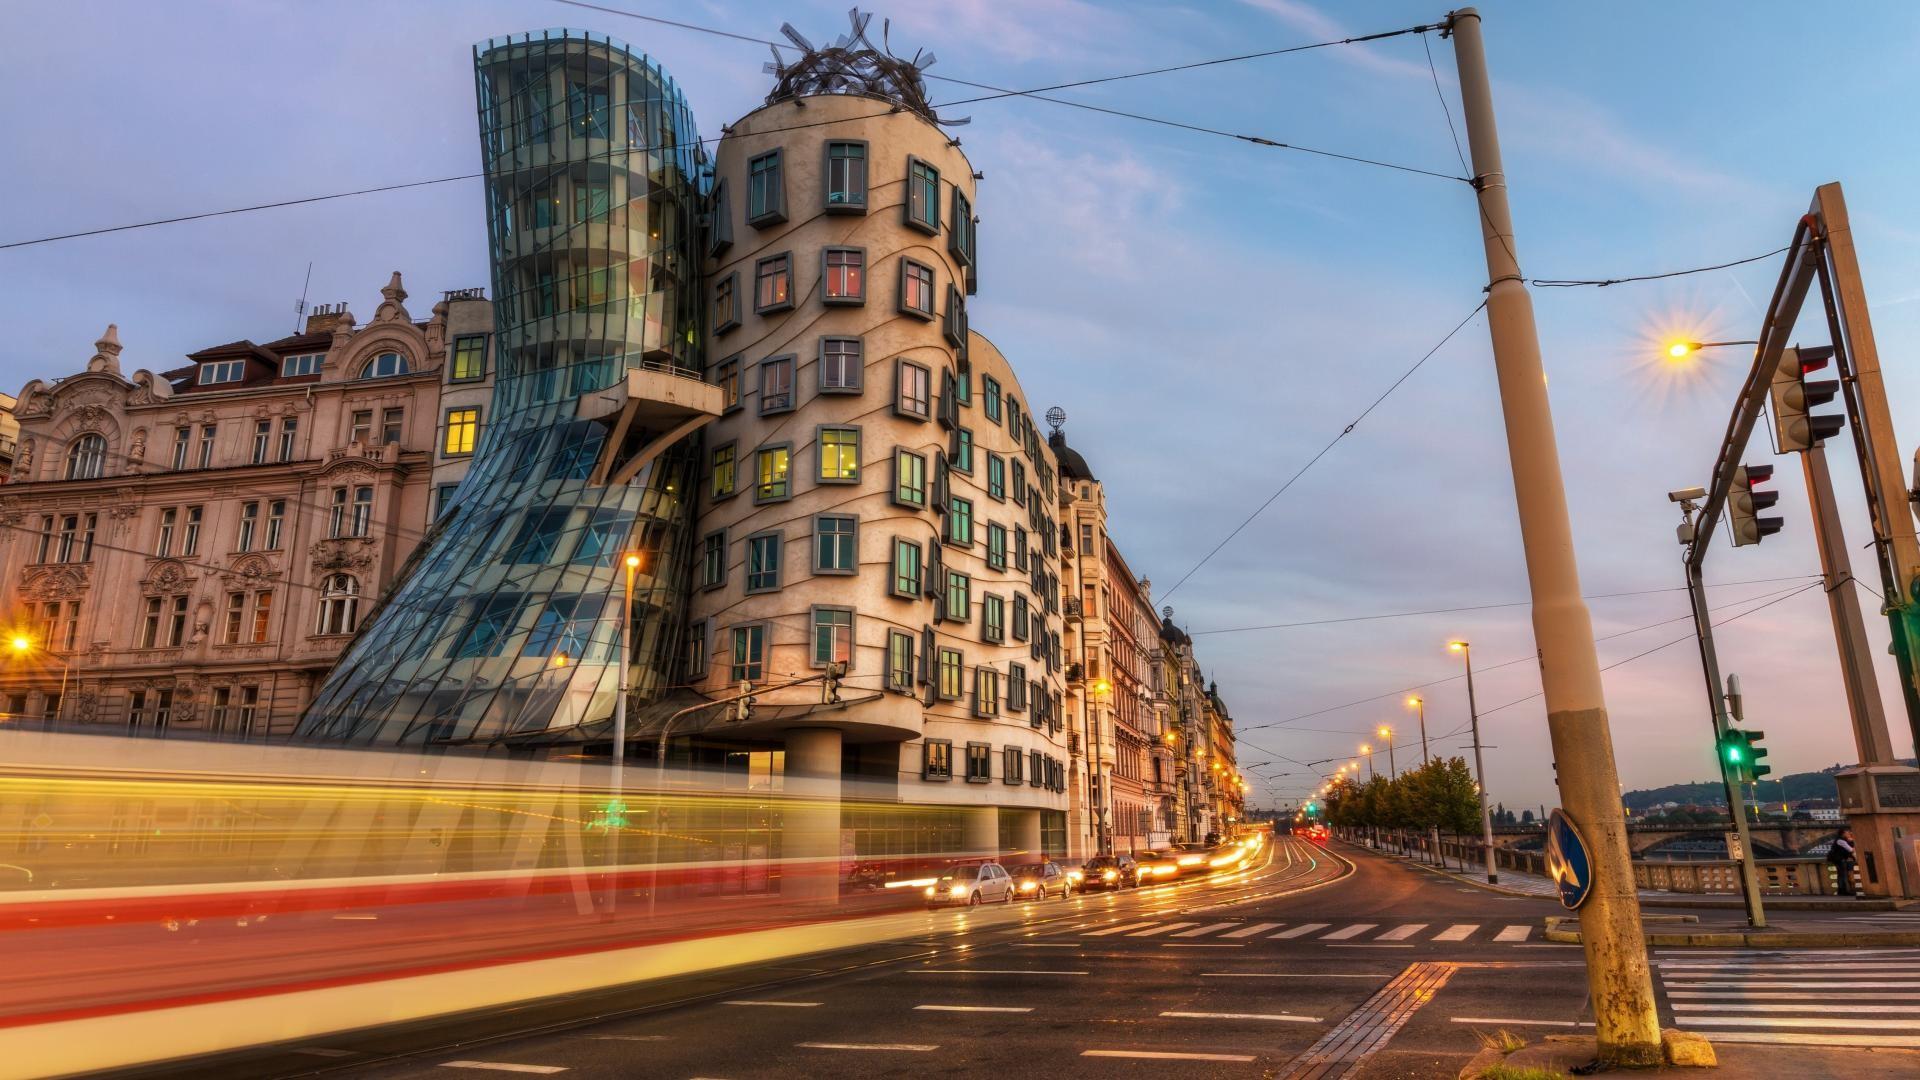 Wallpaper : street light, city, cityscape, architecture, dancing, car, road, clouds, evening, bridge, modern, light trails, capital, old building, ...